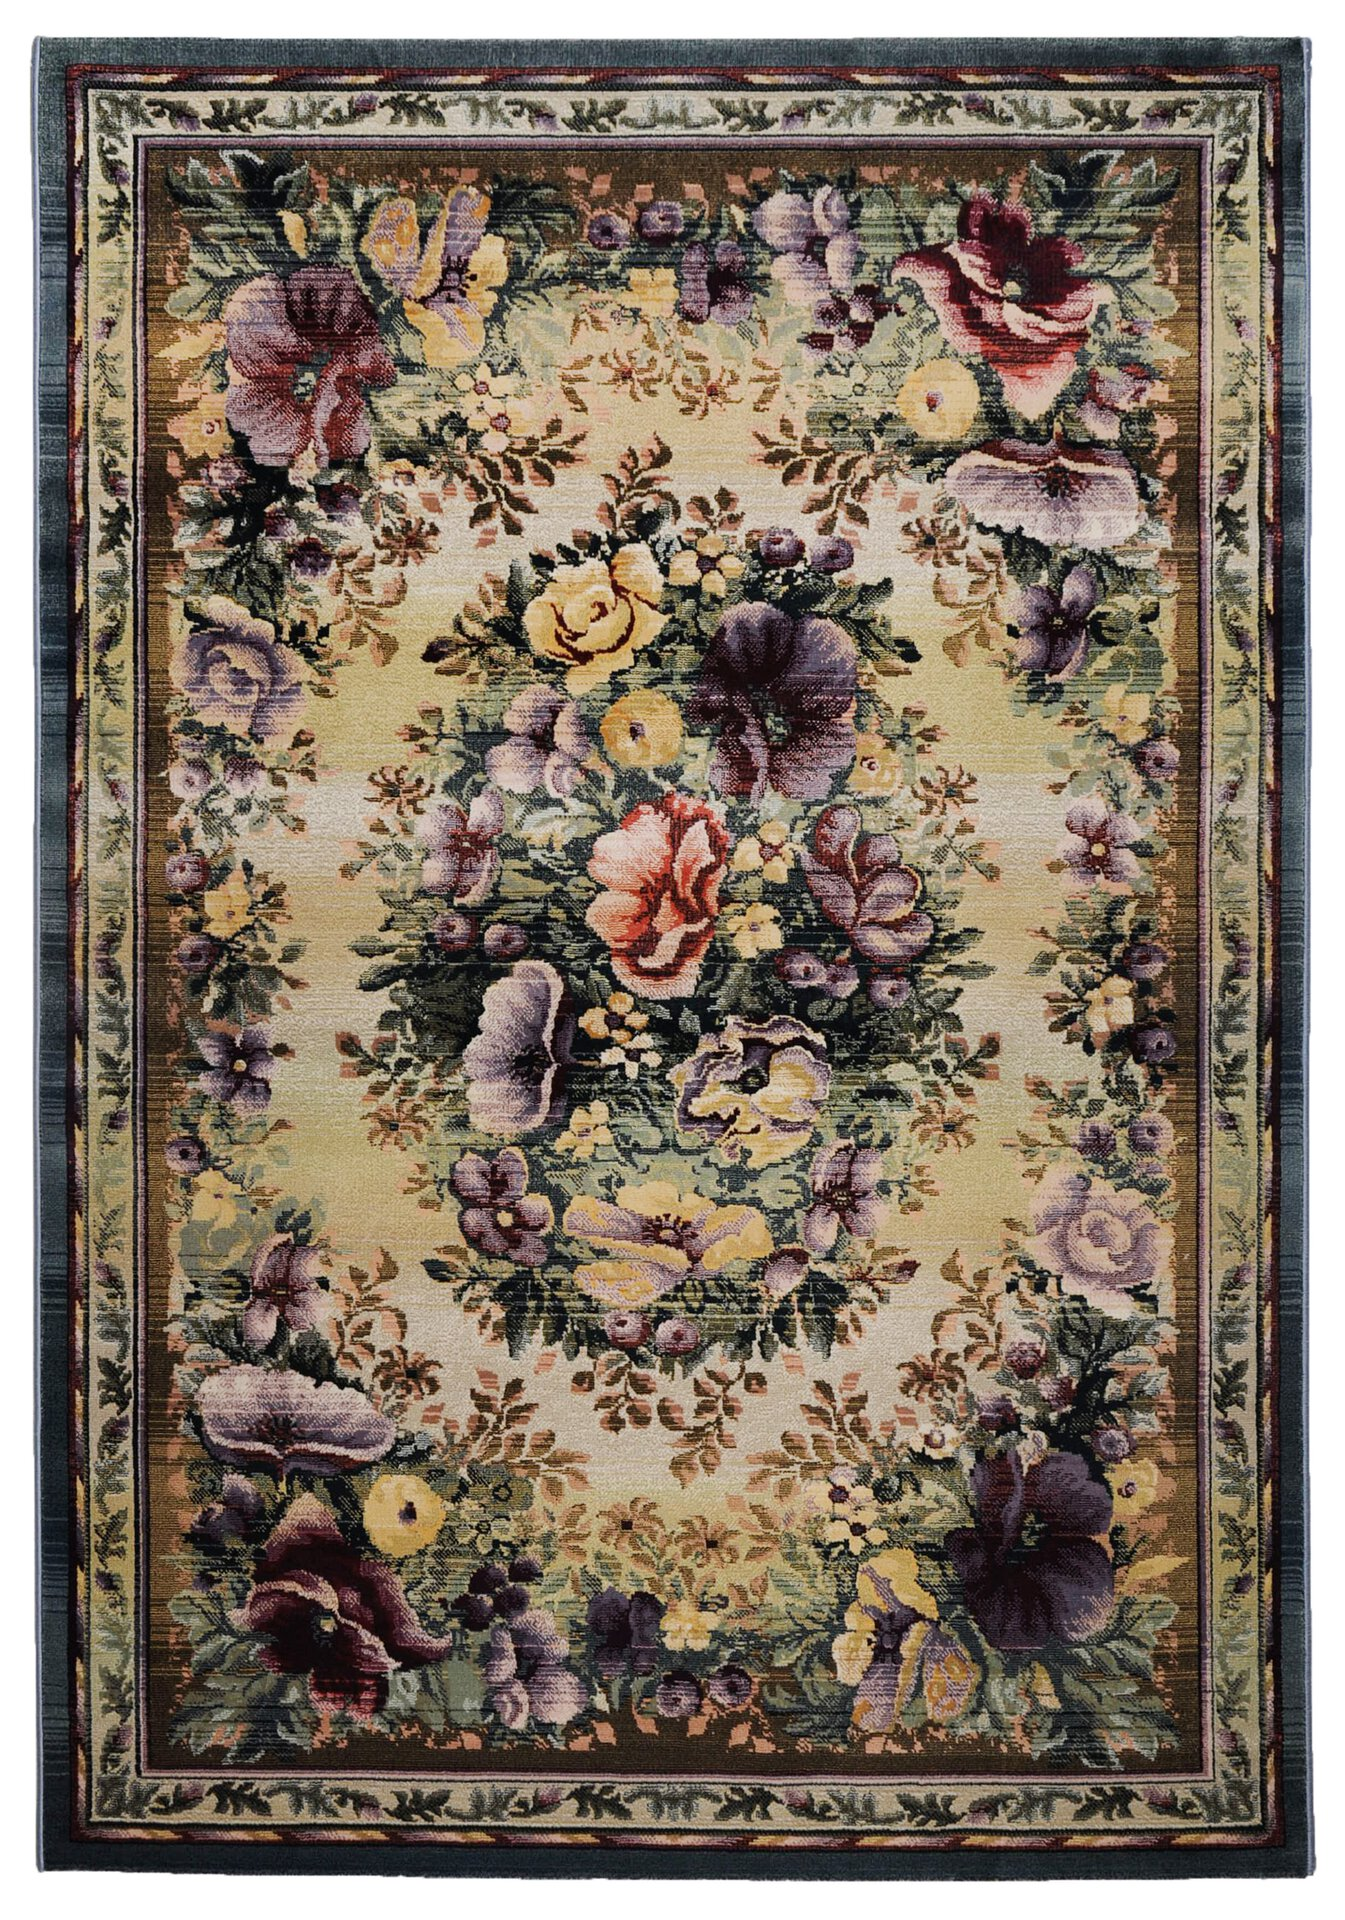 Maschinenwebteppich Gabiro Theko Textil mehrfarbig 120 x 180 cm